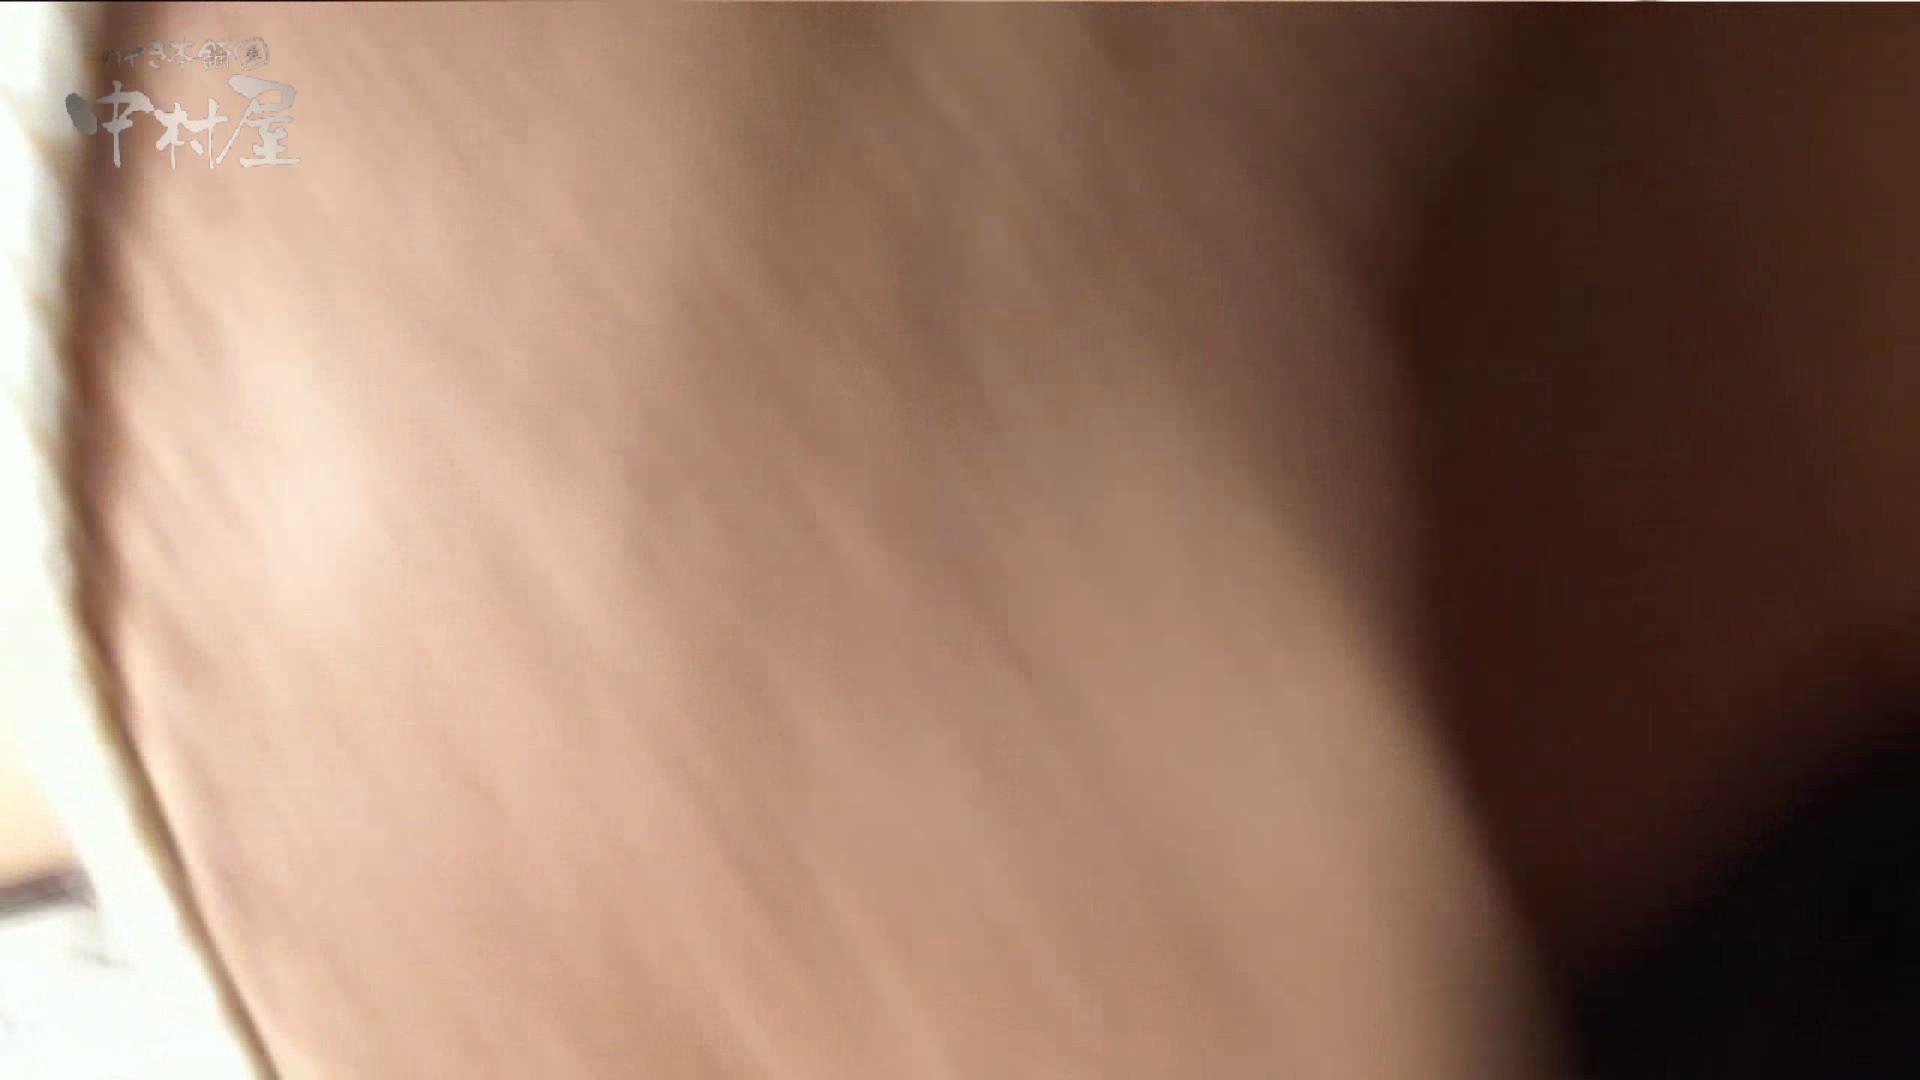 vol.73 美人アパレル胸チラ&パンチラ 目の下のホクロがエッチな店員さん 0  66連発 18